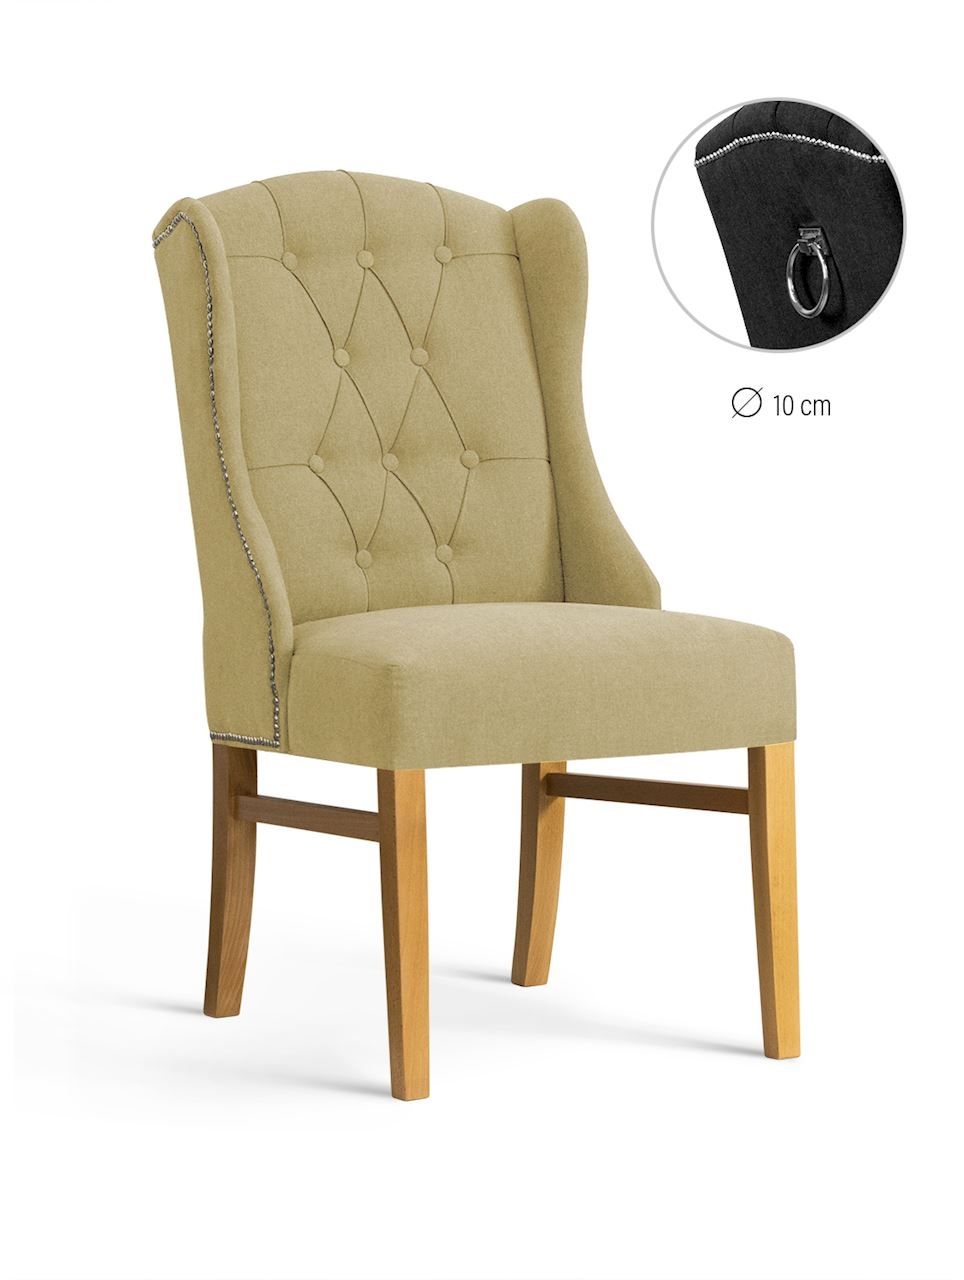 Scaun tapitat cu stofa, cu picioare din lemn Royal Beige / Oak, l55xA74xH105 cm somproduct.ro